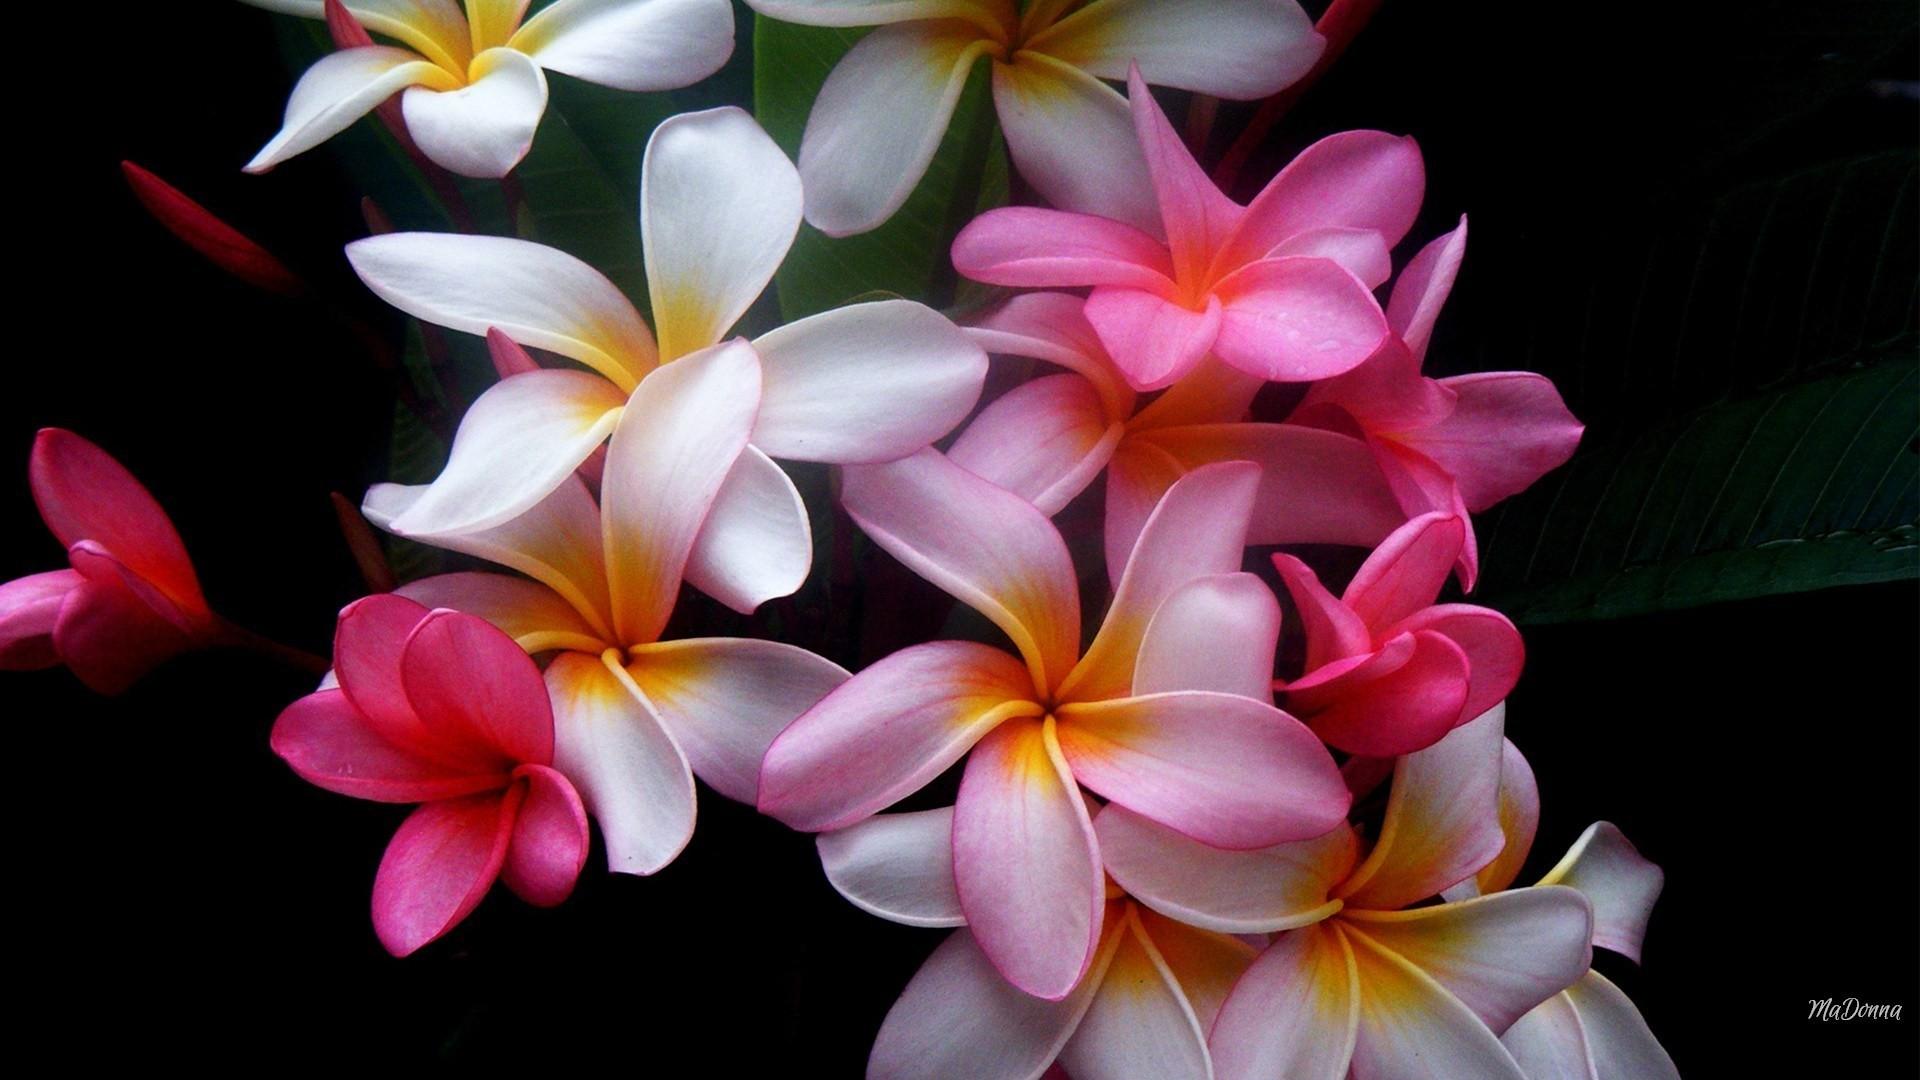 Res: 1920x1080, tropical flower wallpaper #174368